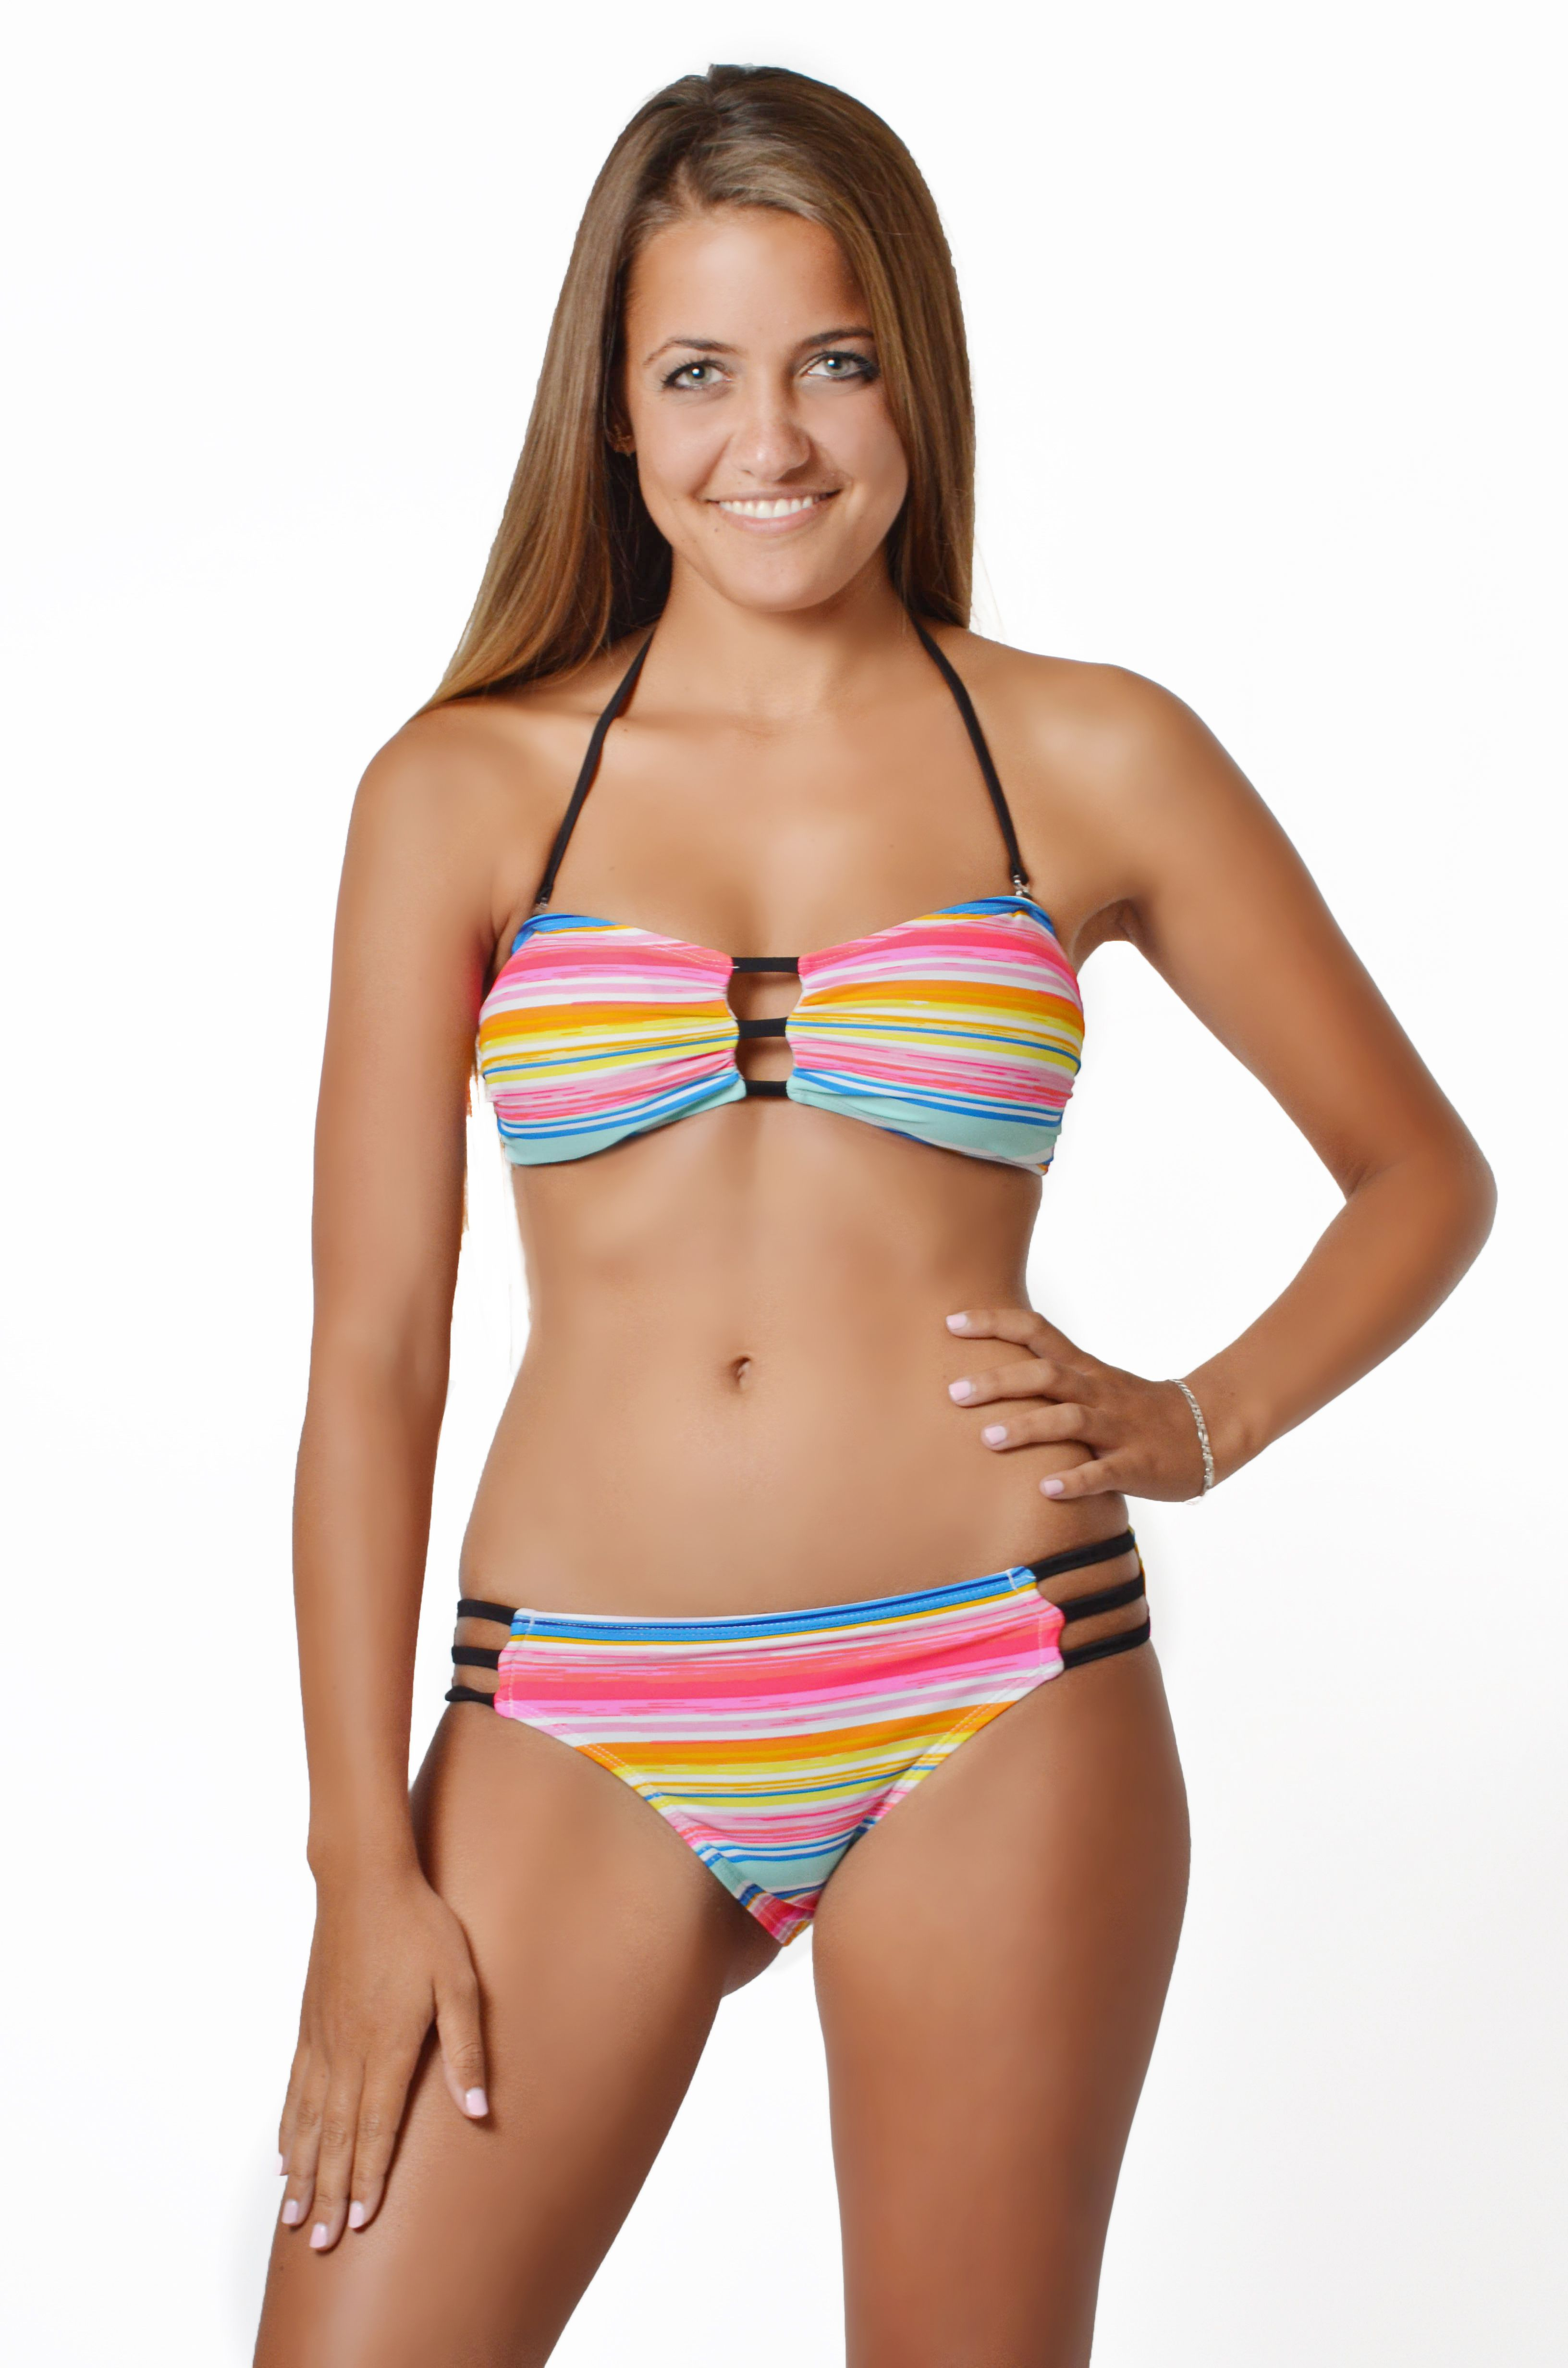 574adb9c8e8e 2014 Sun Stripe #winkiswim #bikini #neon #stripe #bathingsuit #model #swim # swimwear